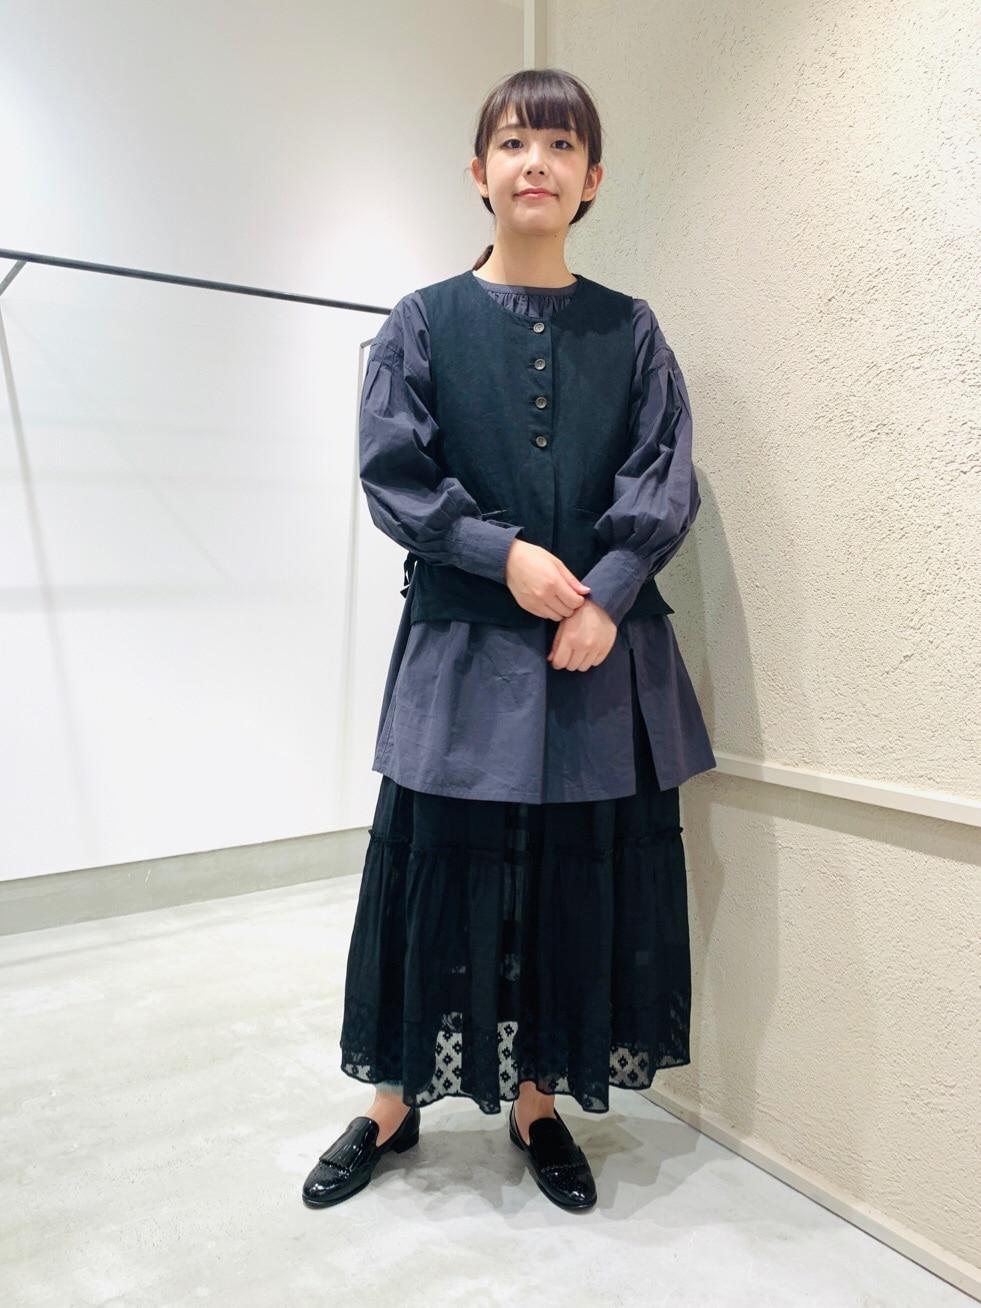 chambre de charme 横浜ジョイナス 身長:162cm 2020.10.05